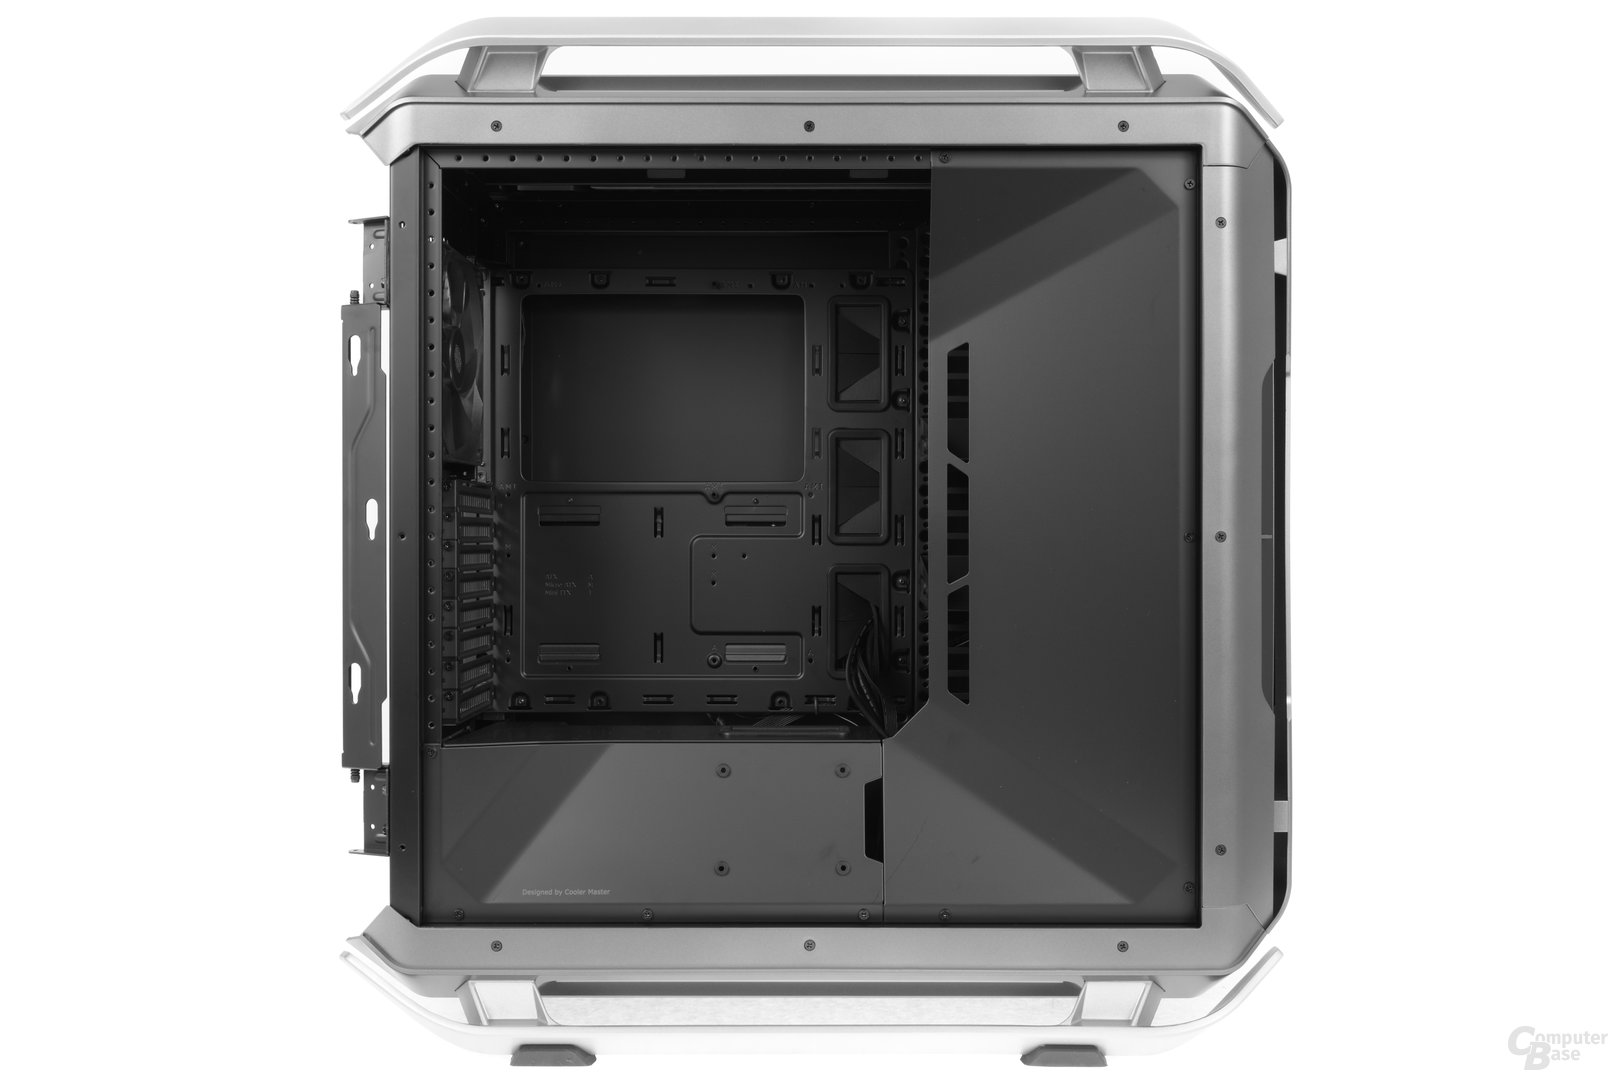 Cooler Master Cosmos C700P – Innenraumansicht